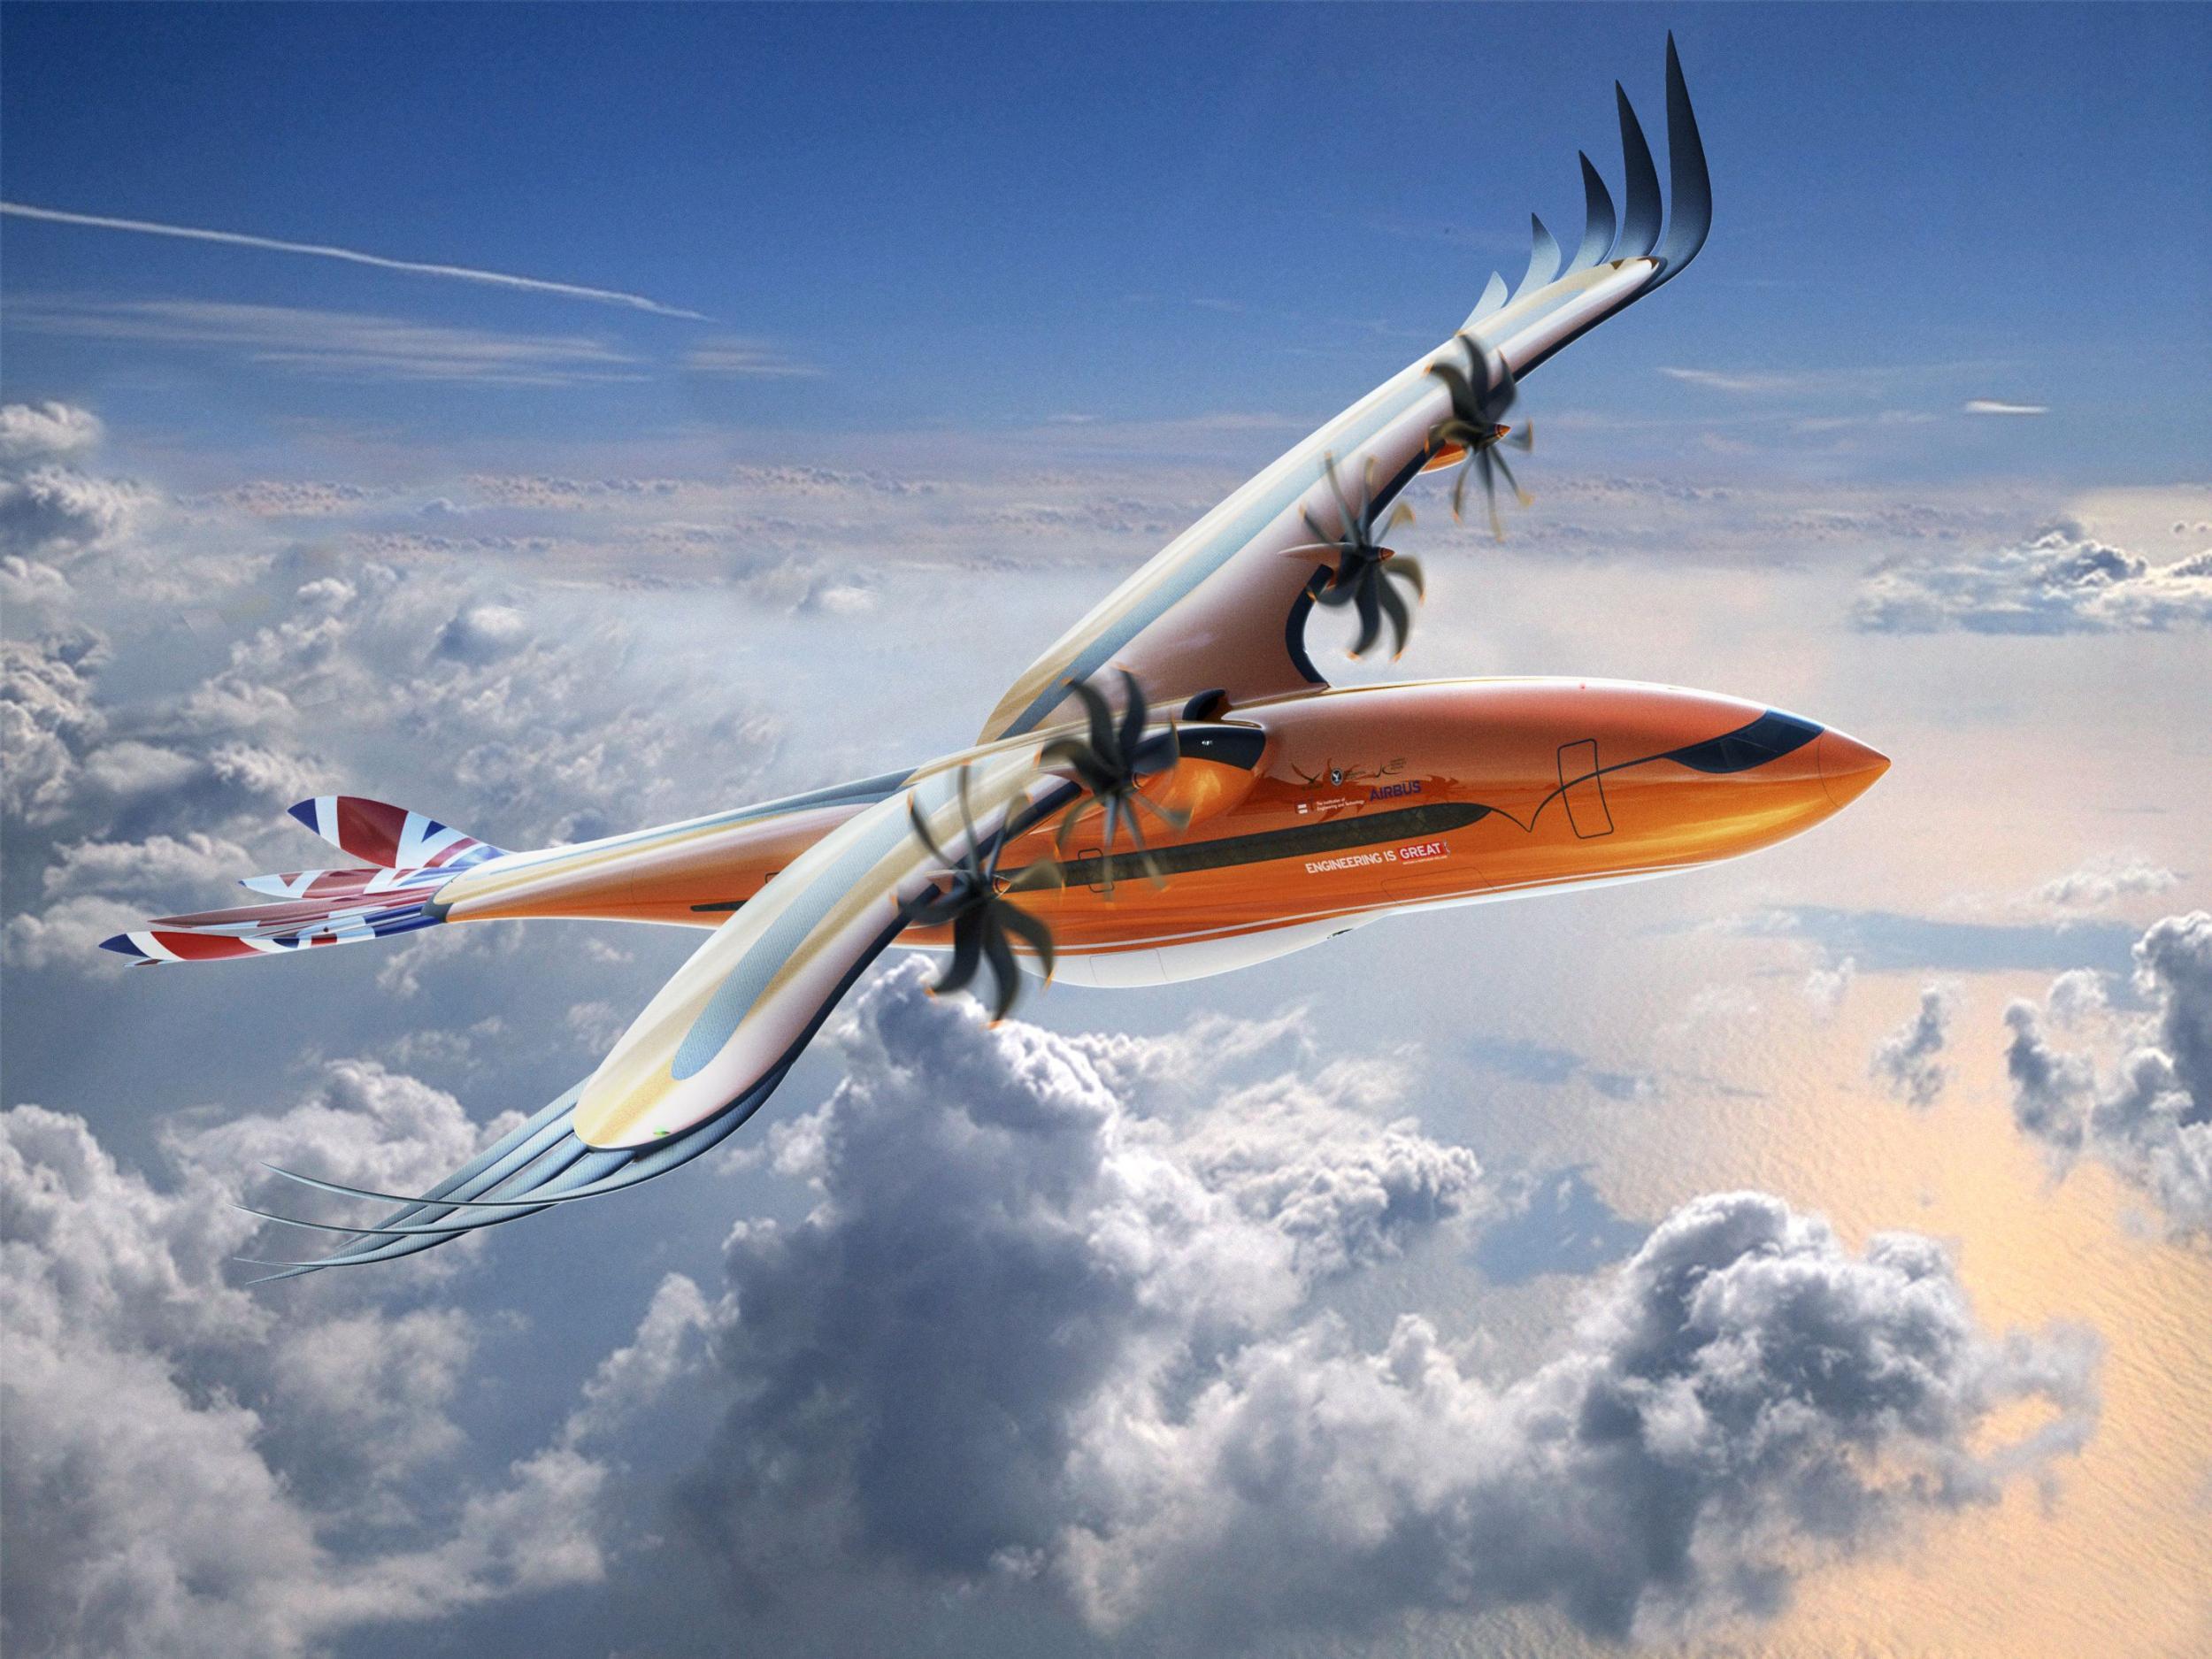 Airbus unveils new plane design that looks like bird of prey